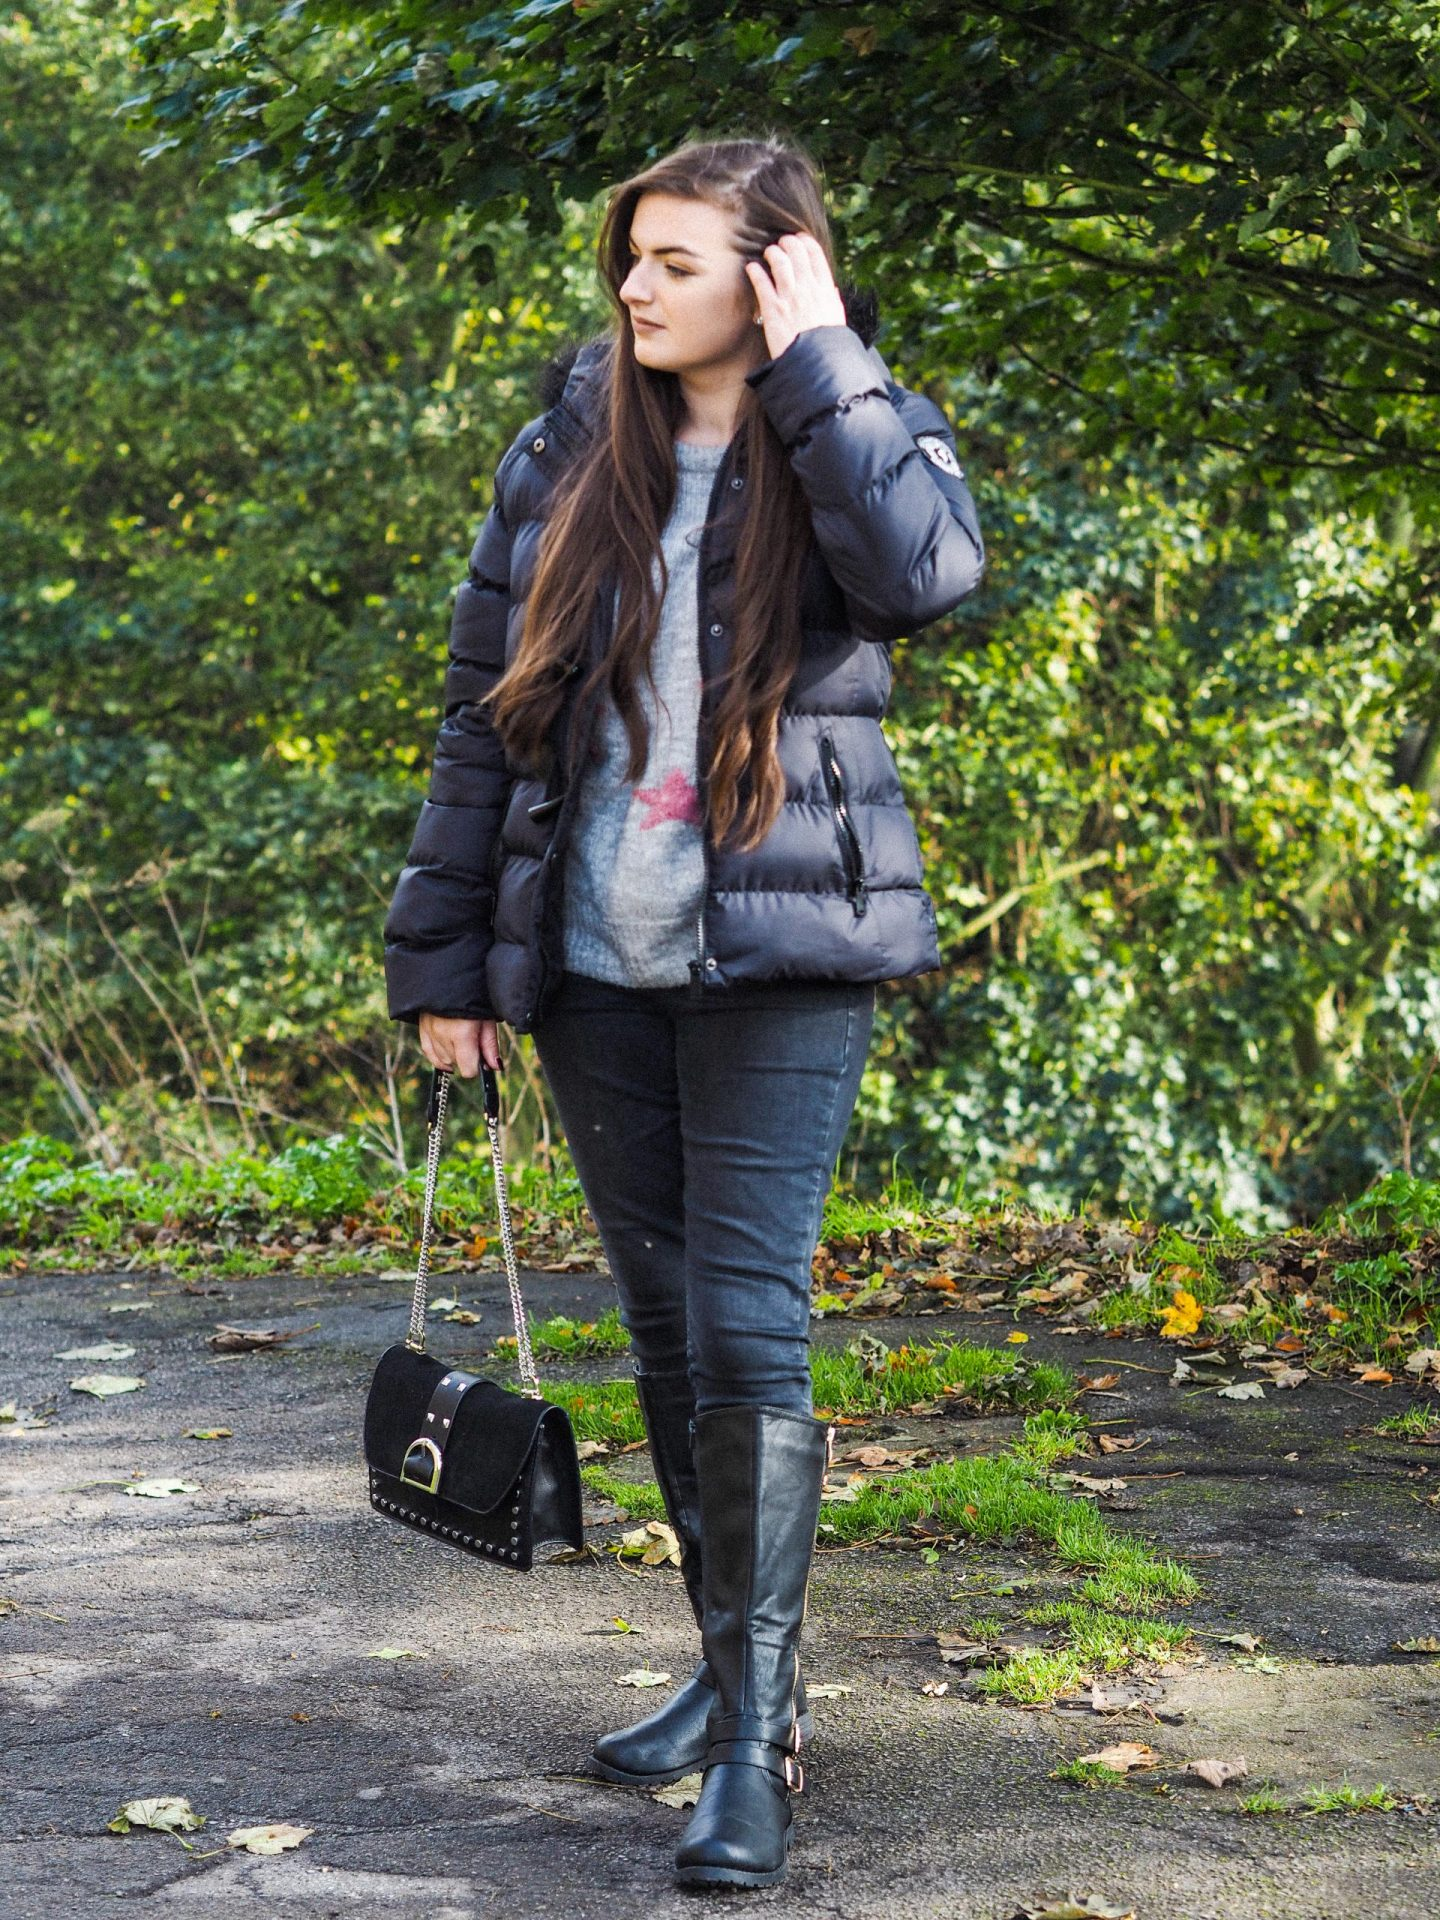 Wrapping up for Autumn with Studio.co.uk - Rachel Nicole UK Blogger